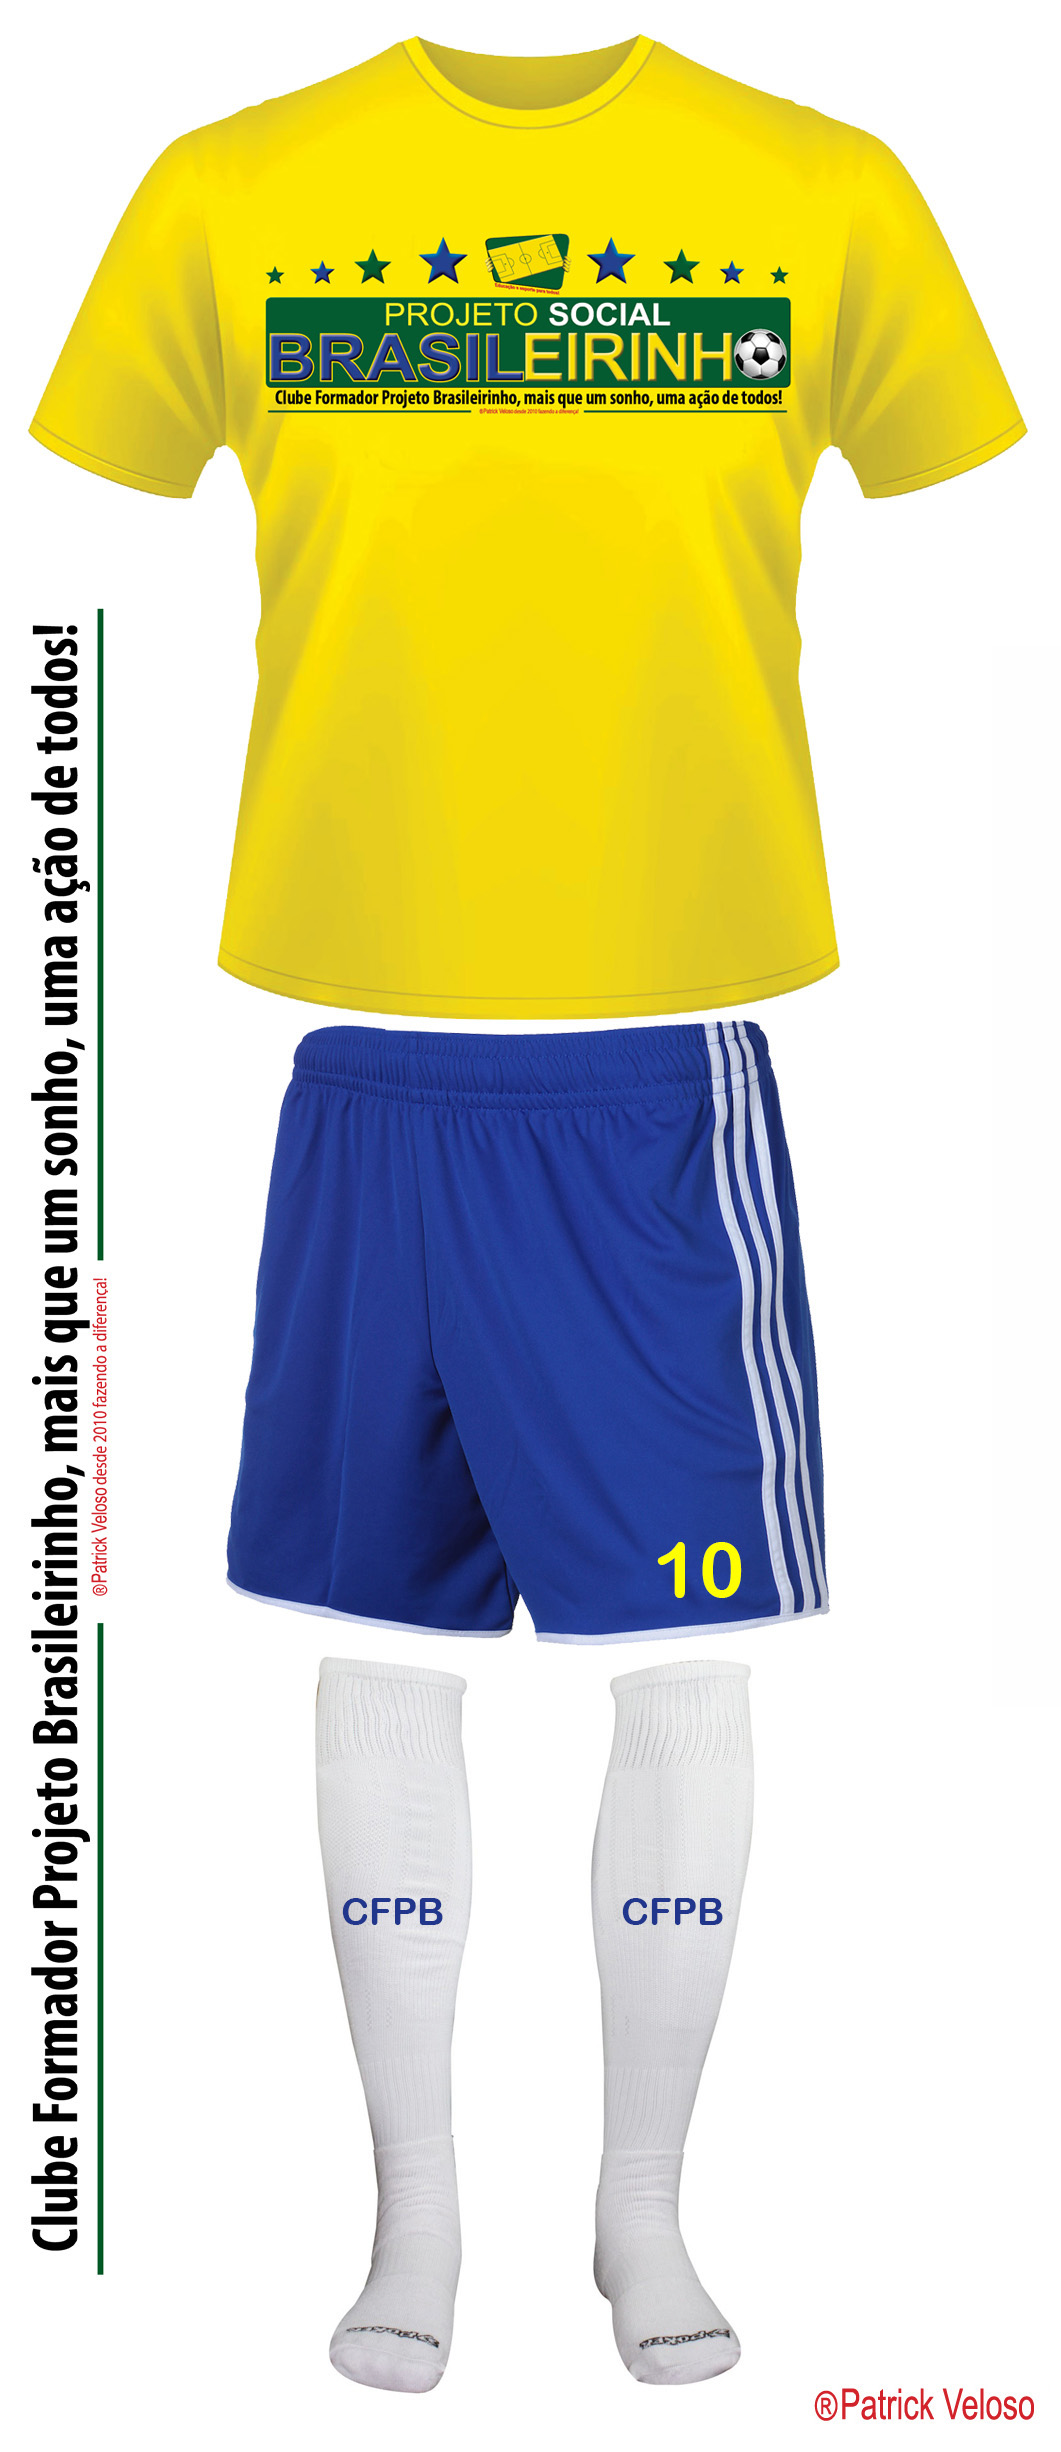 Uniforme do CFPB